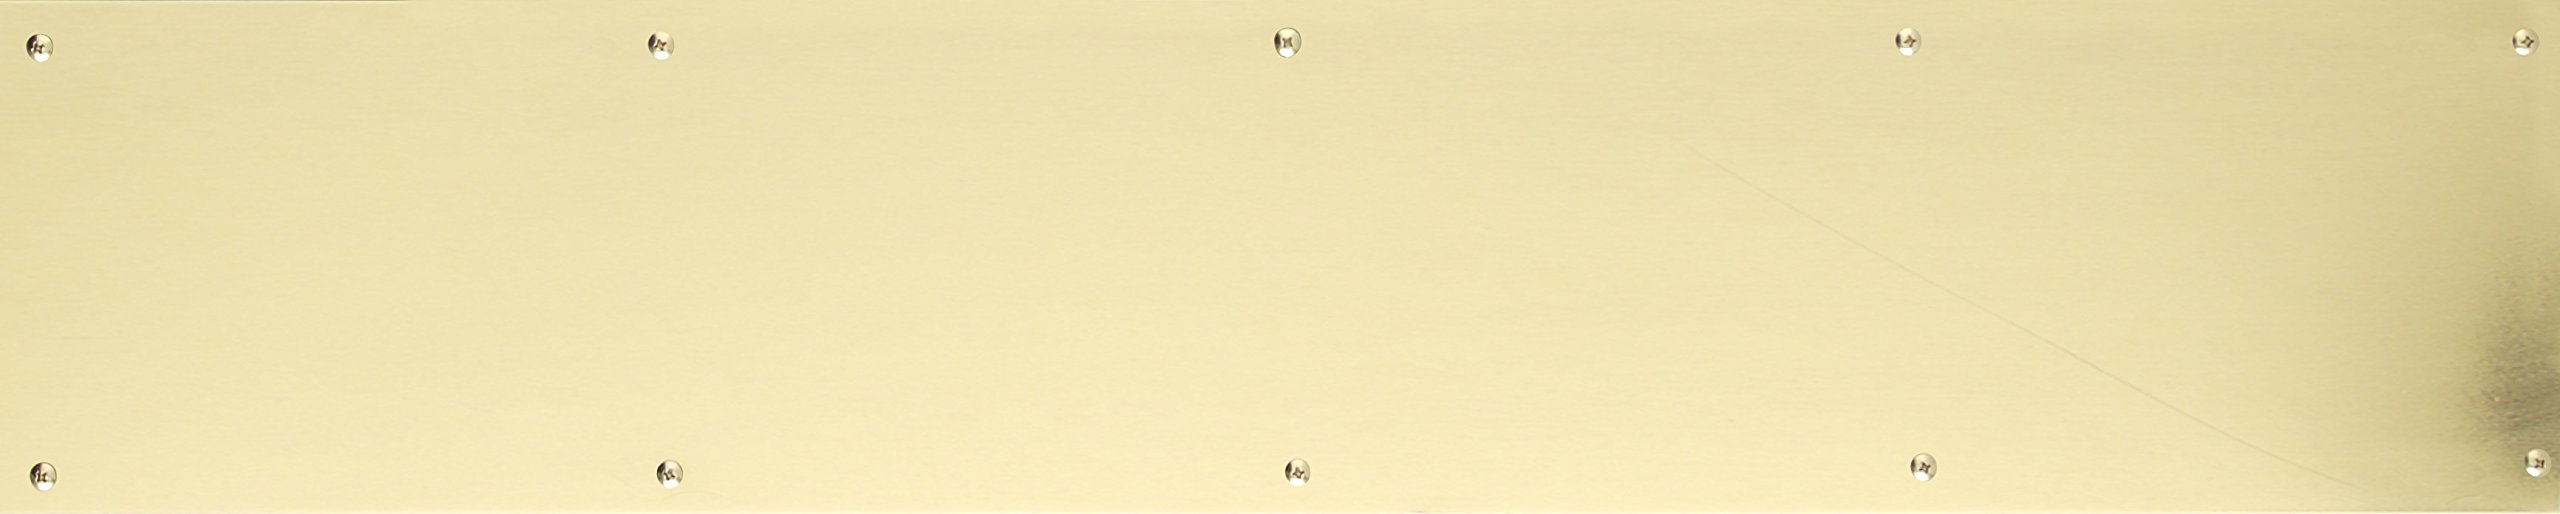 BRASS Accents A09-P0840-PVD Kick Plate Screw Mount, 8'' x 40'', Lifetime Polished Brass